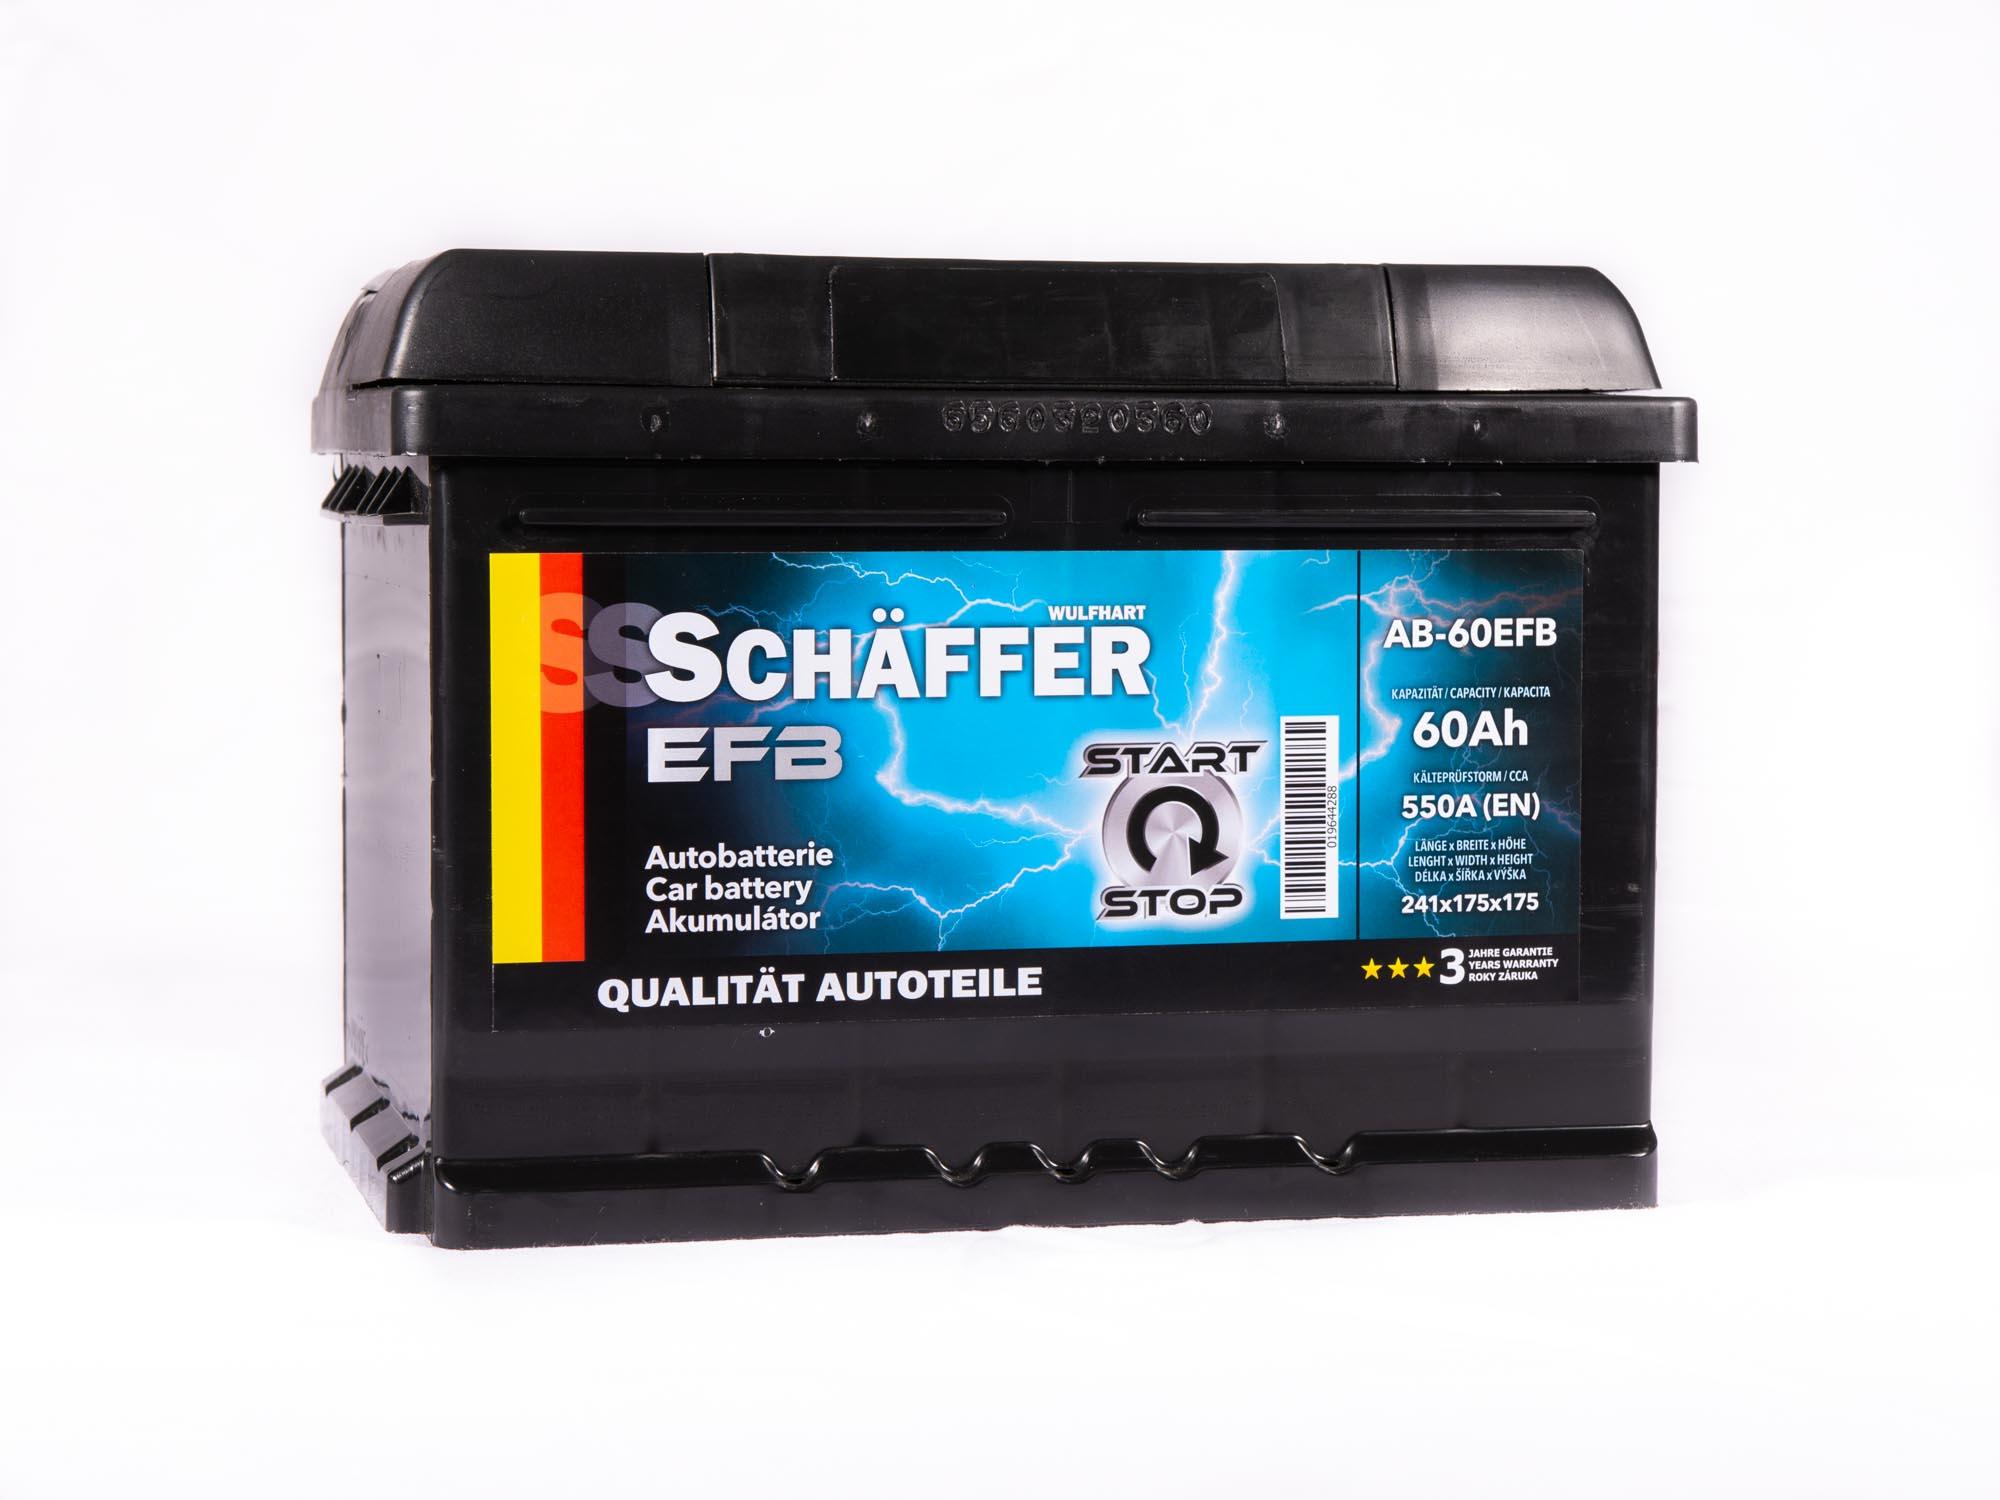 Schaffer Autobaterie EFB 60Ah Start-Stop